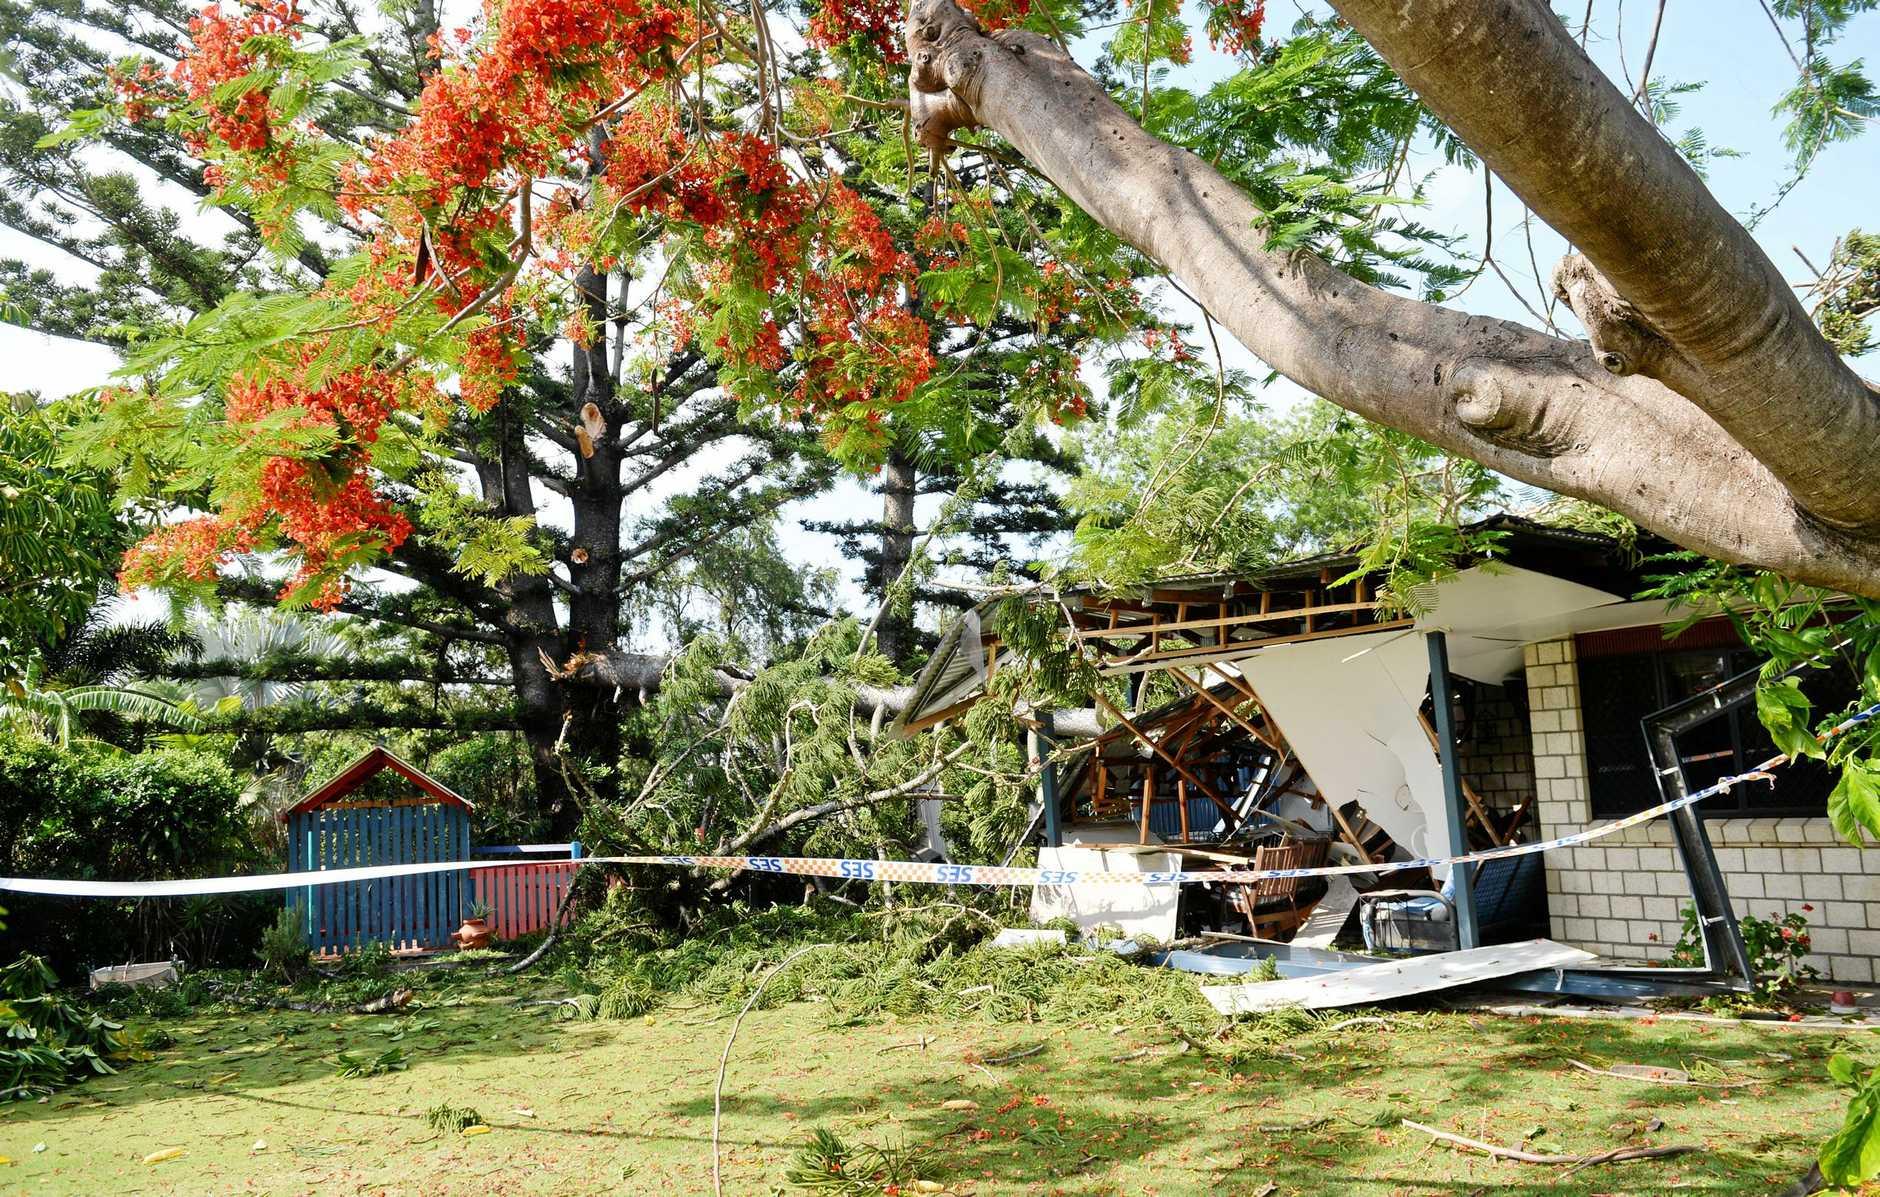 House damaged by falling tree on Elphinstone St.